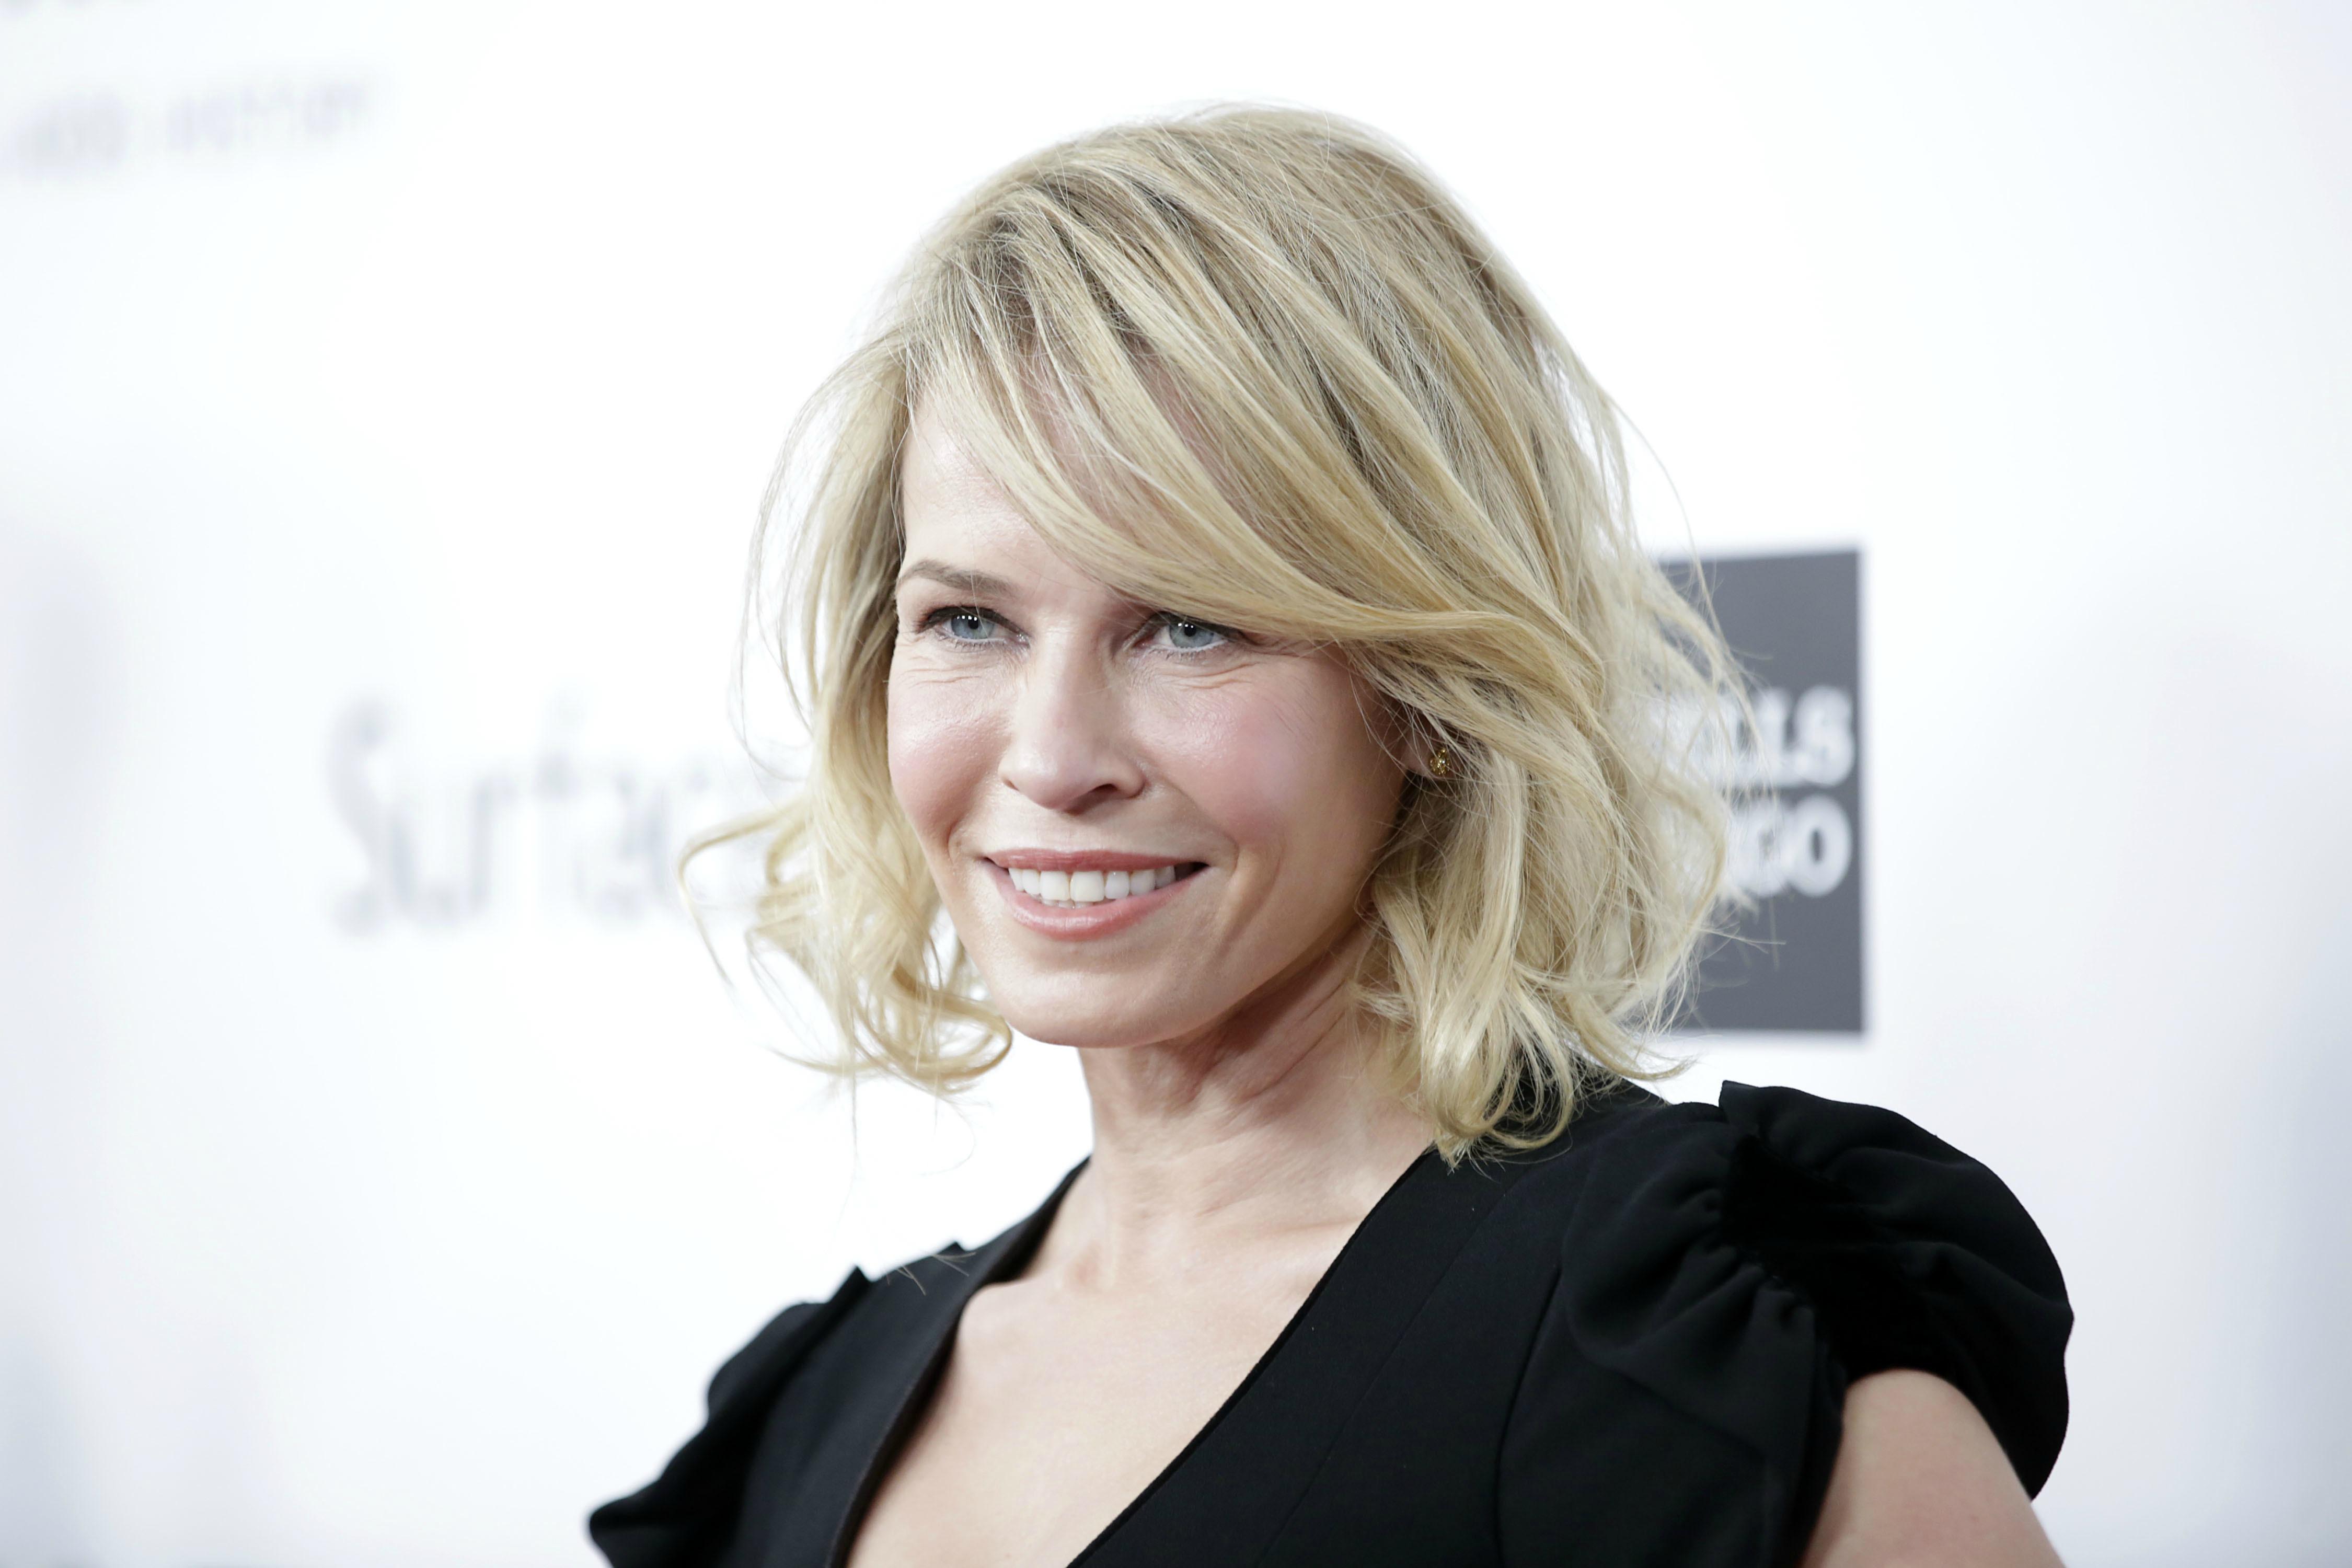 CBS denies rumors that Chelsea Handler will be replacing Craig Ferguson